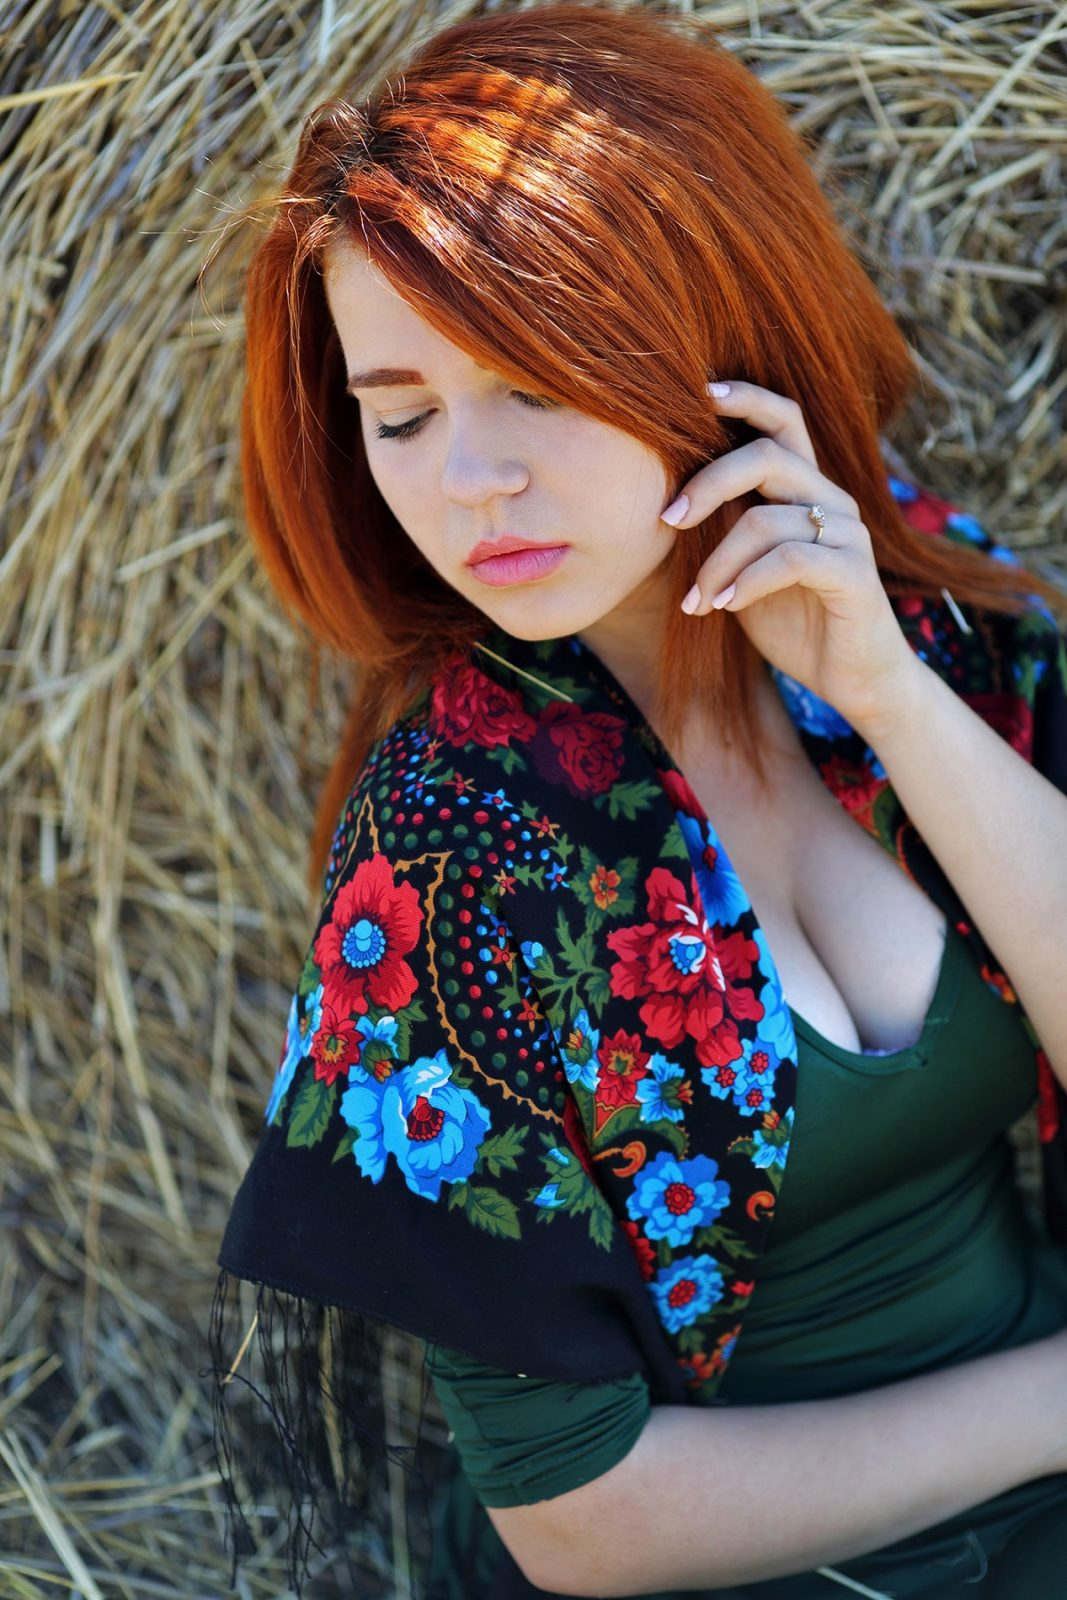 Russian woman. Автор: MURAT KUZHAKHMETOV